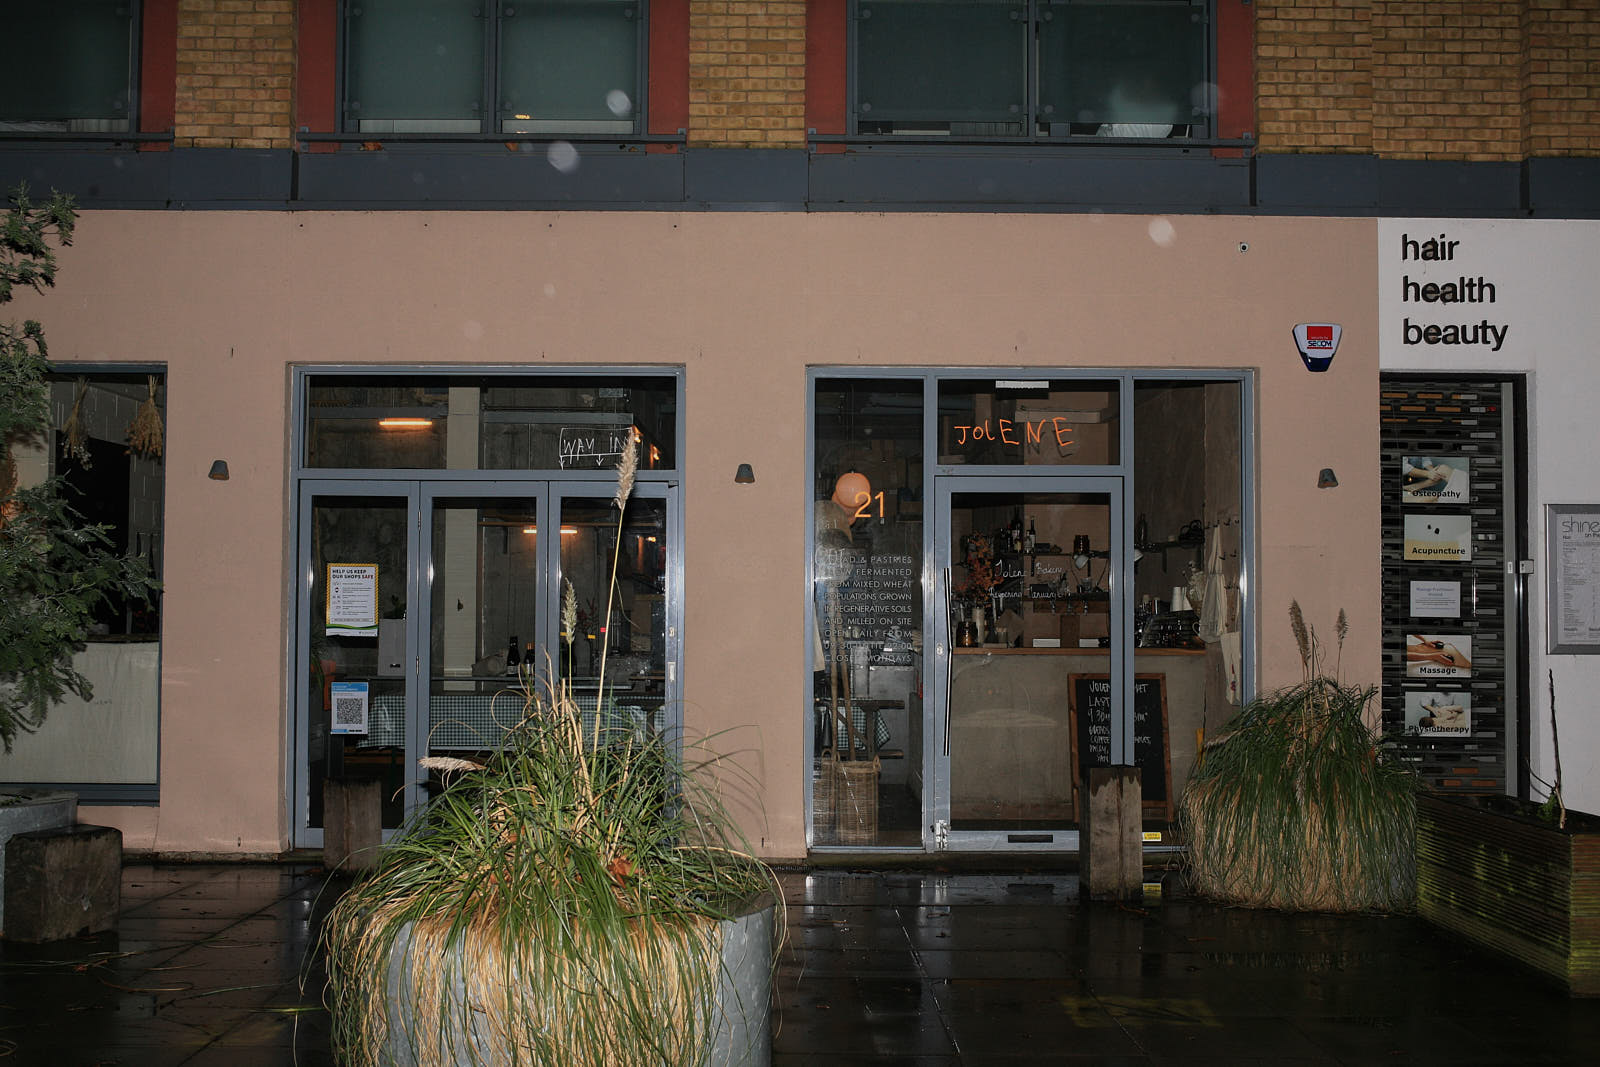 London's coolest bakery—Jolene, Newington Green